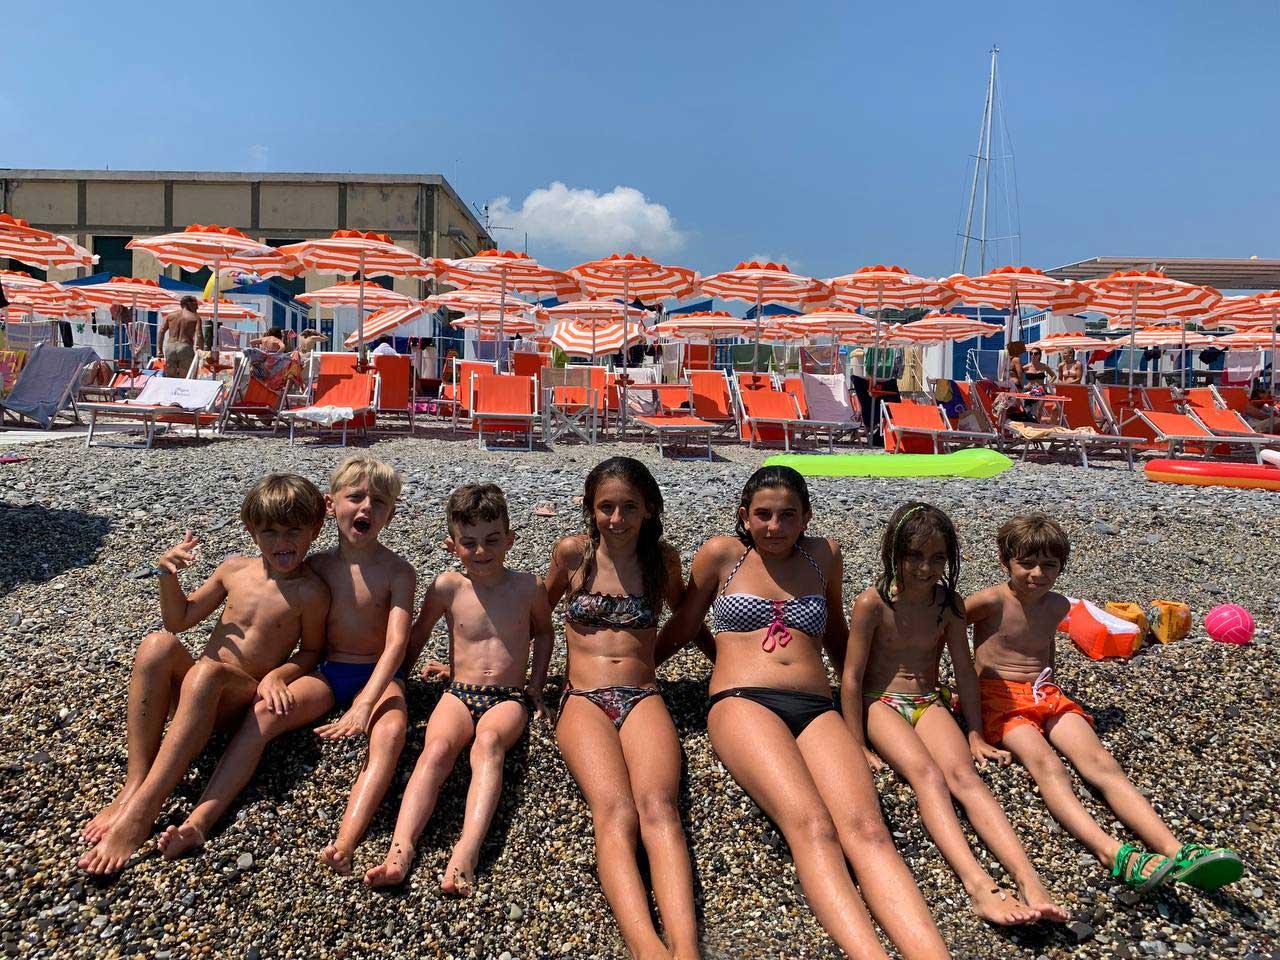 Bambini sul bagnasciuga - Bagni Sirena